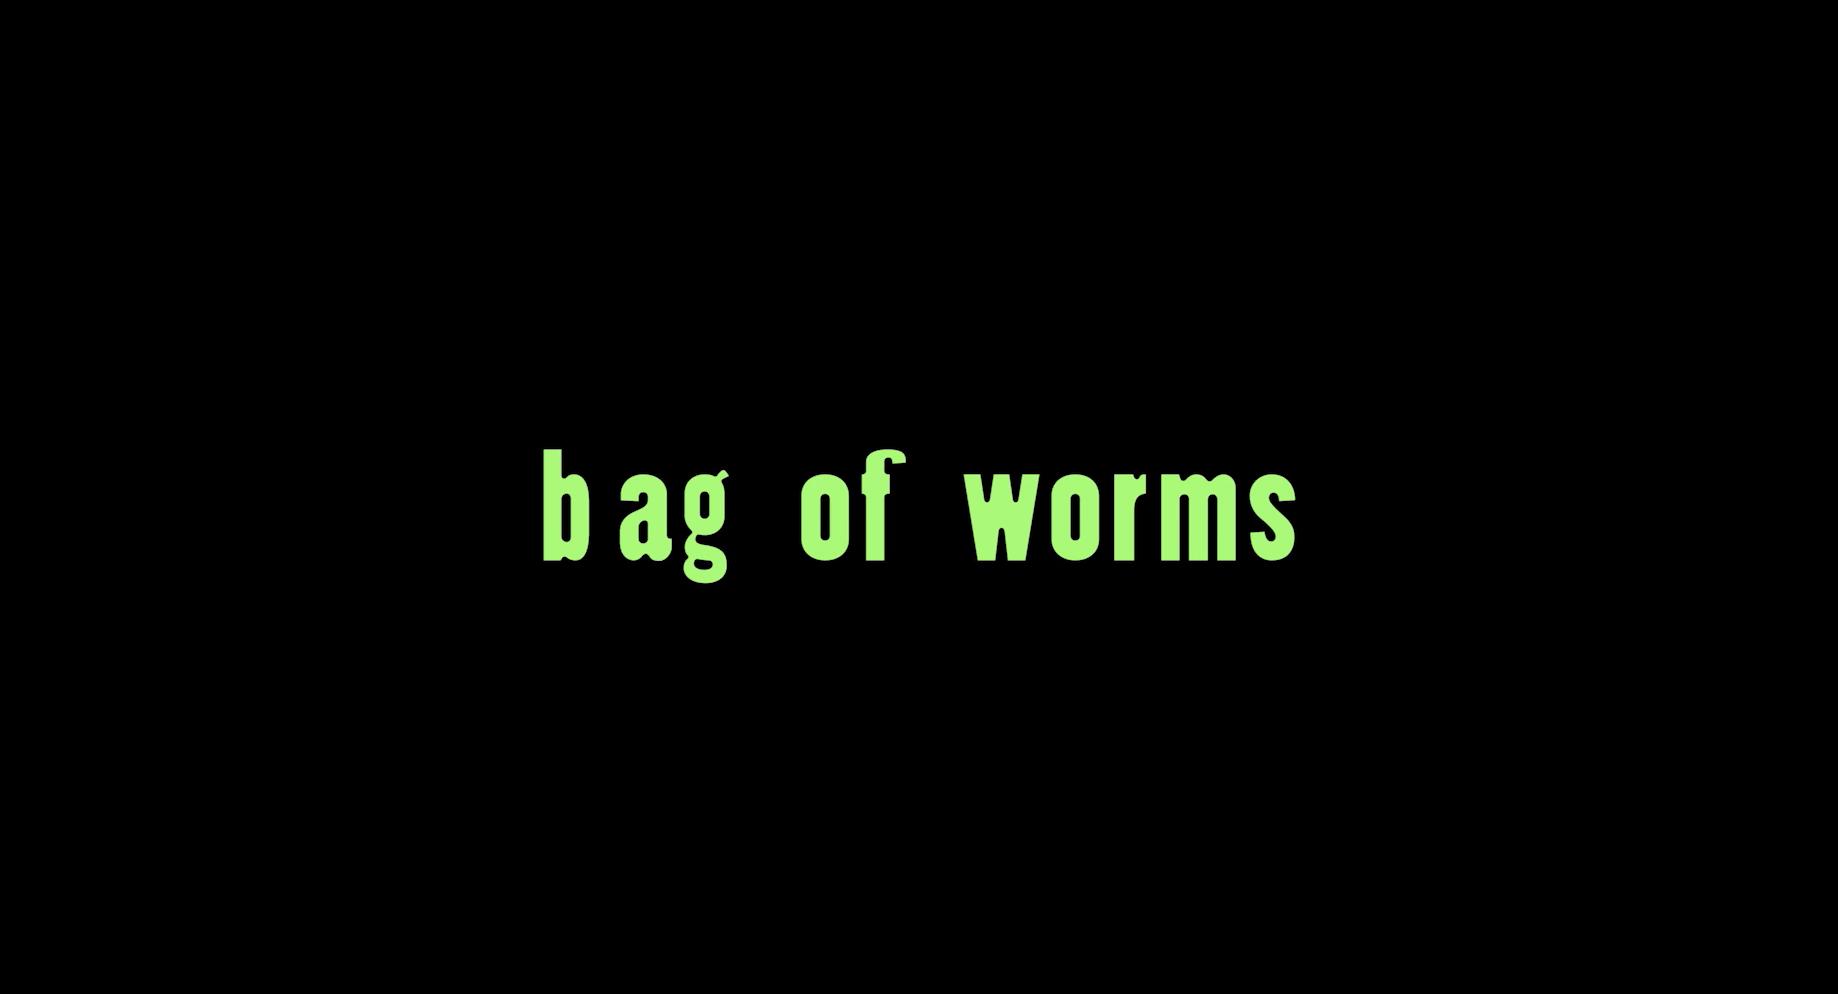 BagofWorms.png